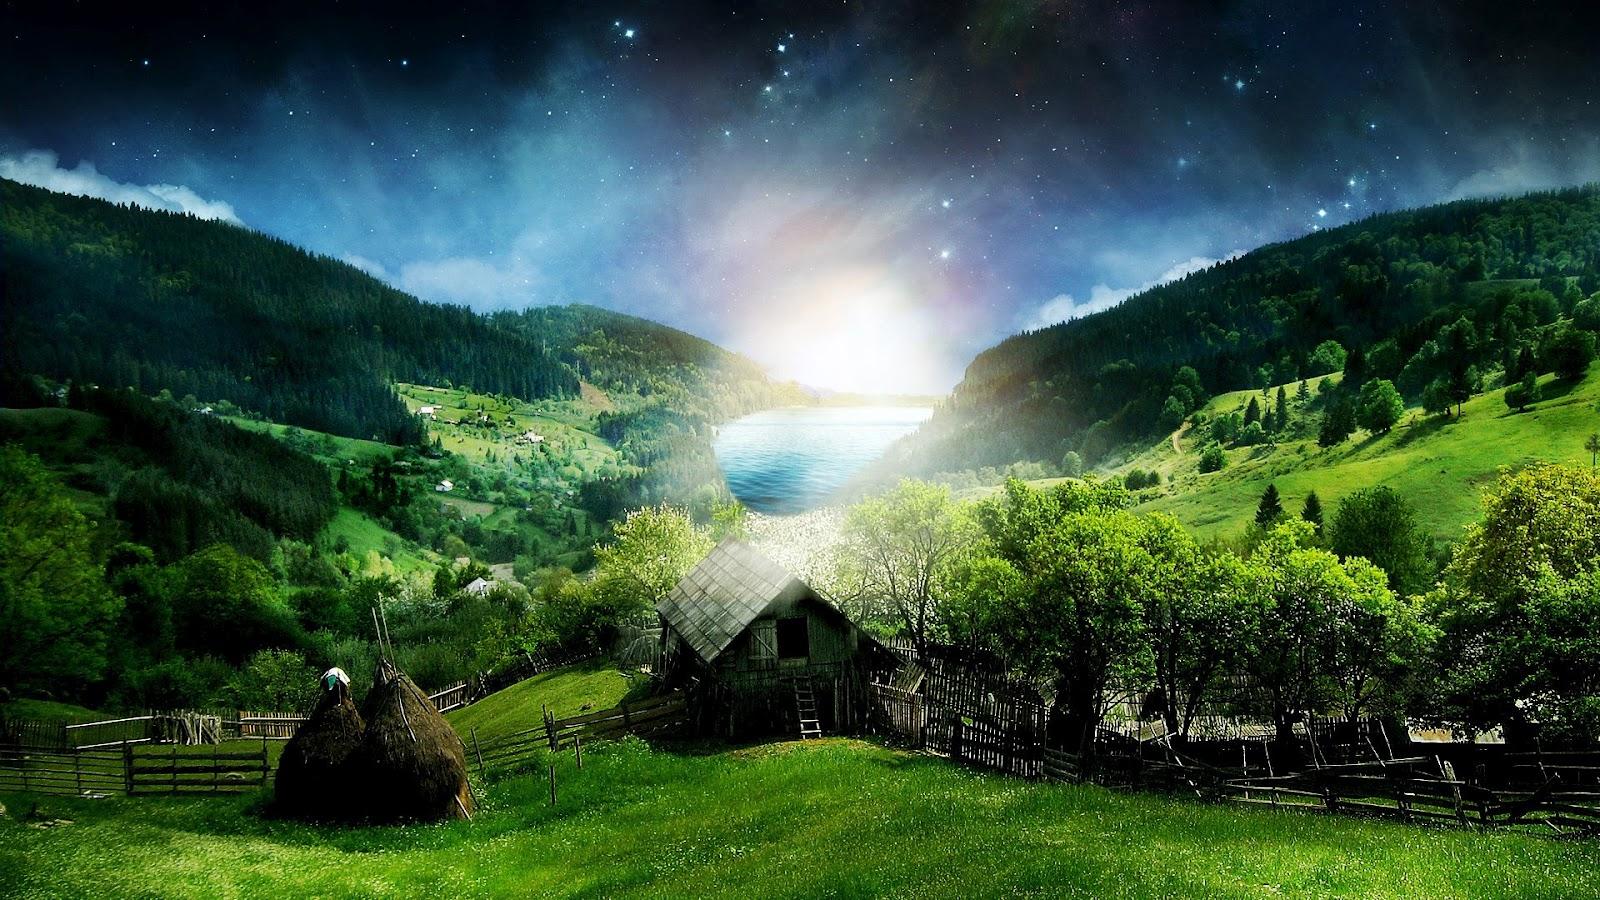 High Resolution Beautiful Nature Jungle Wallpapers Widescreen HD Full 1600x900